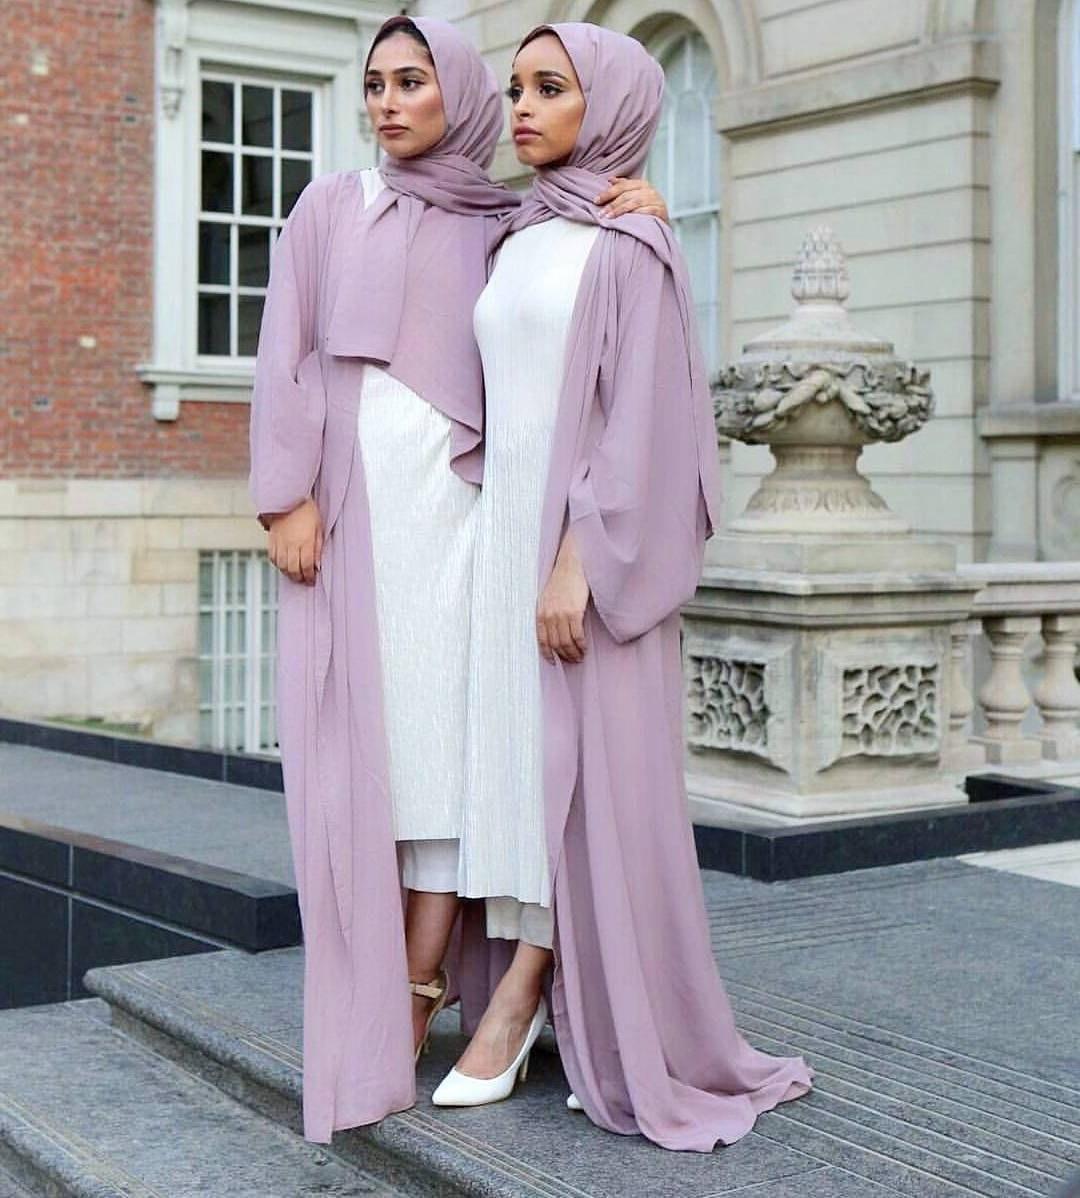 Inspirasi Cari Baju Lebaran 2018 O2d5 50 Model Baju Lebaran Terbaru 2018 Modern & Elegan